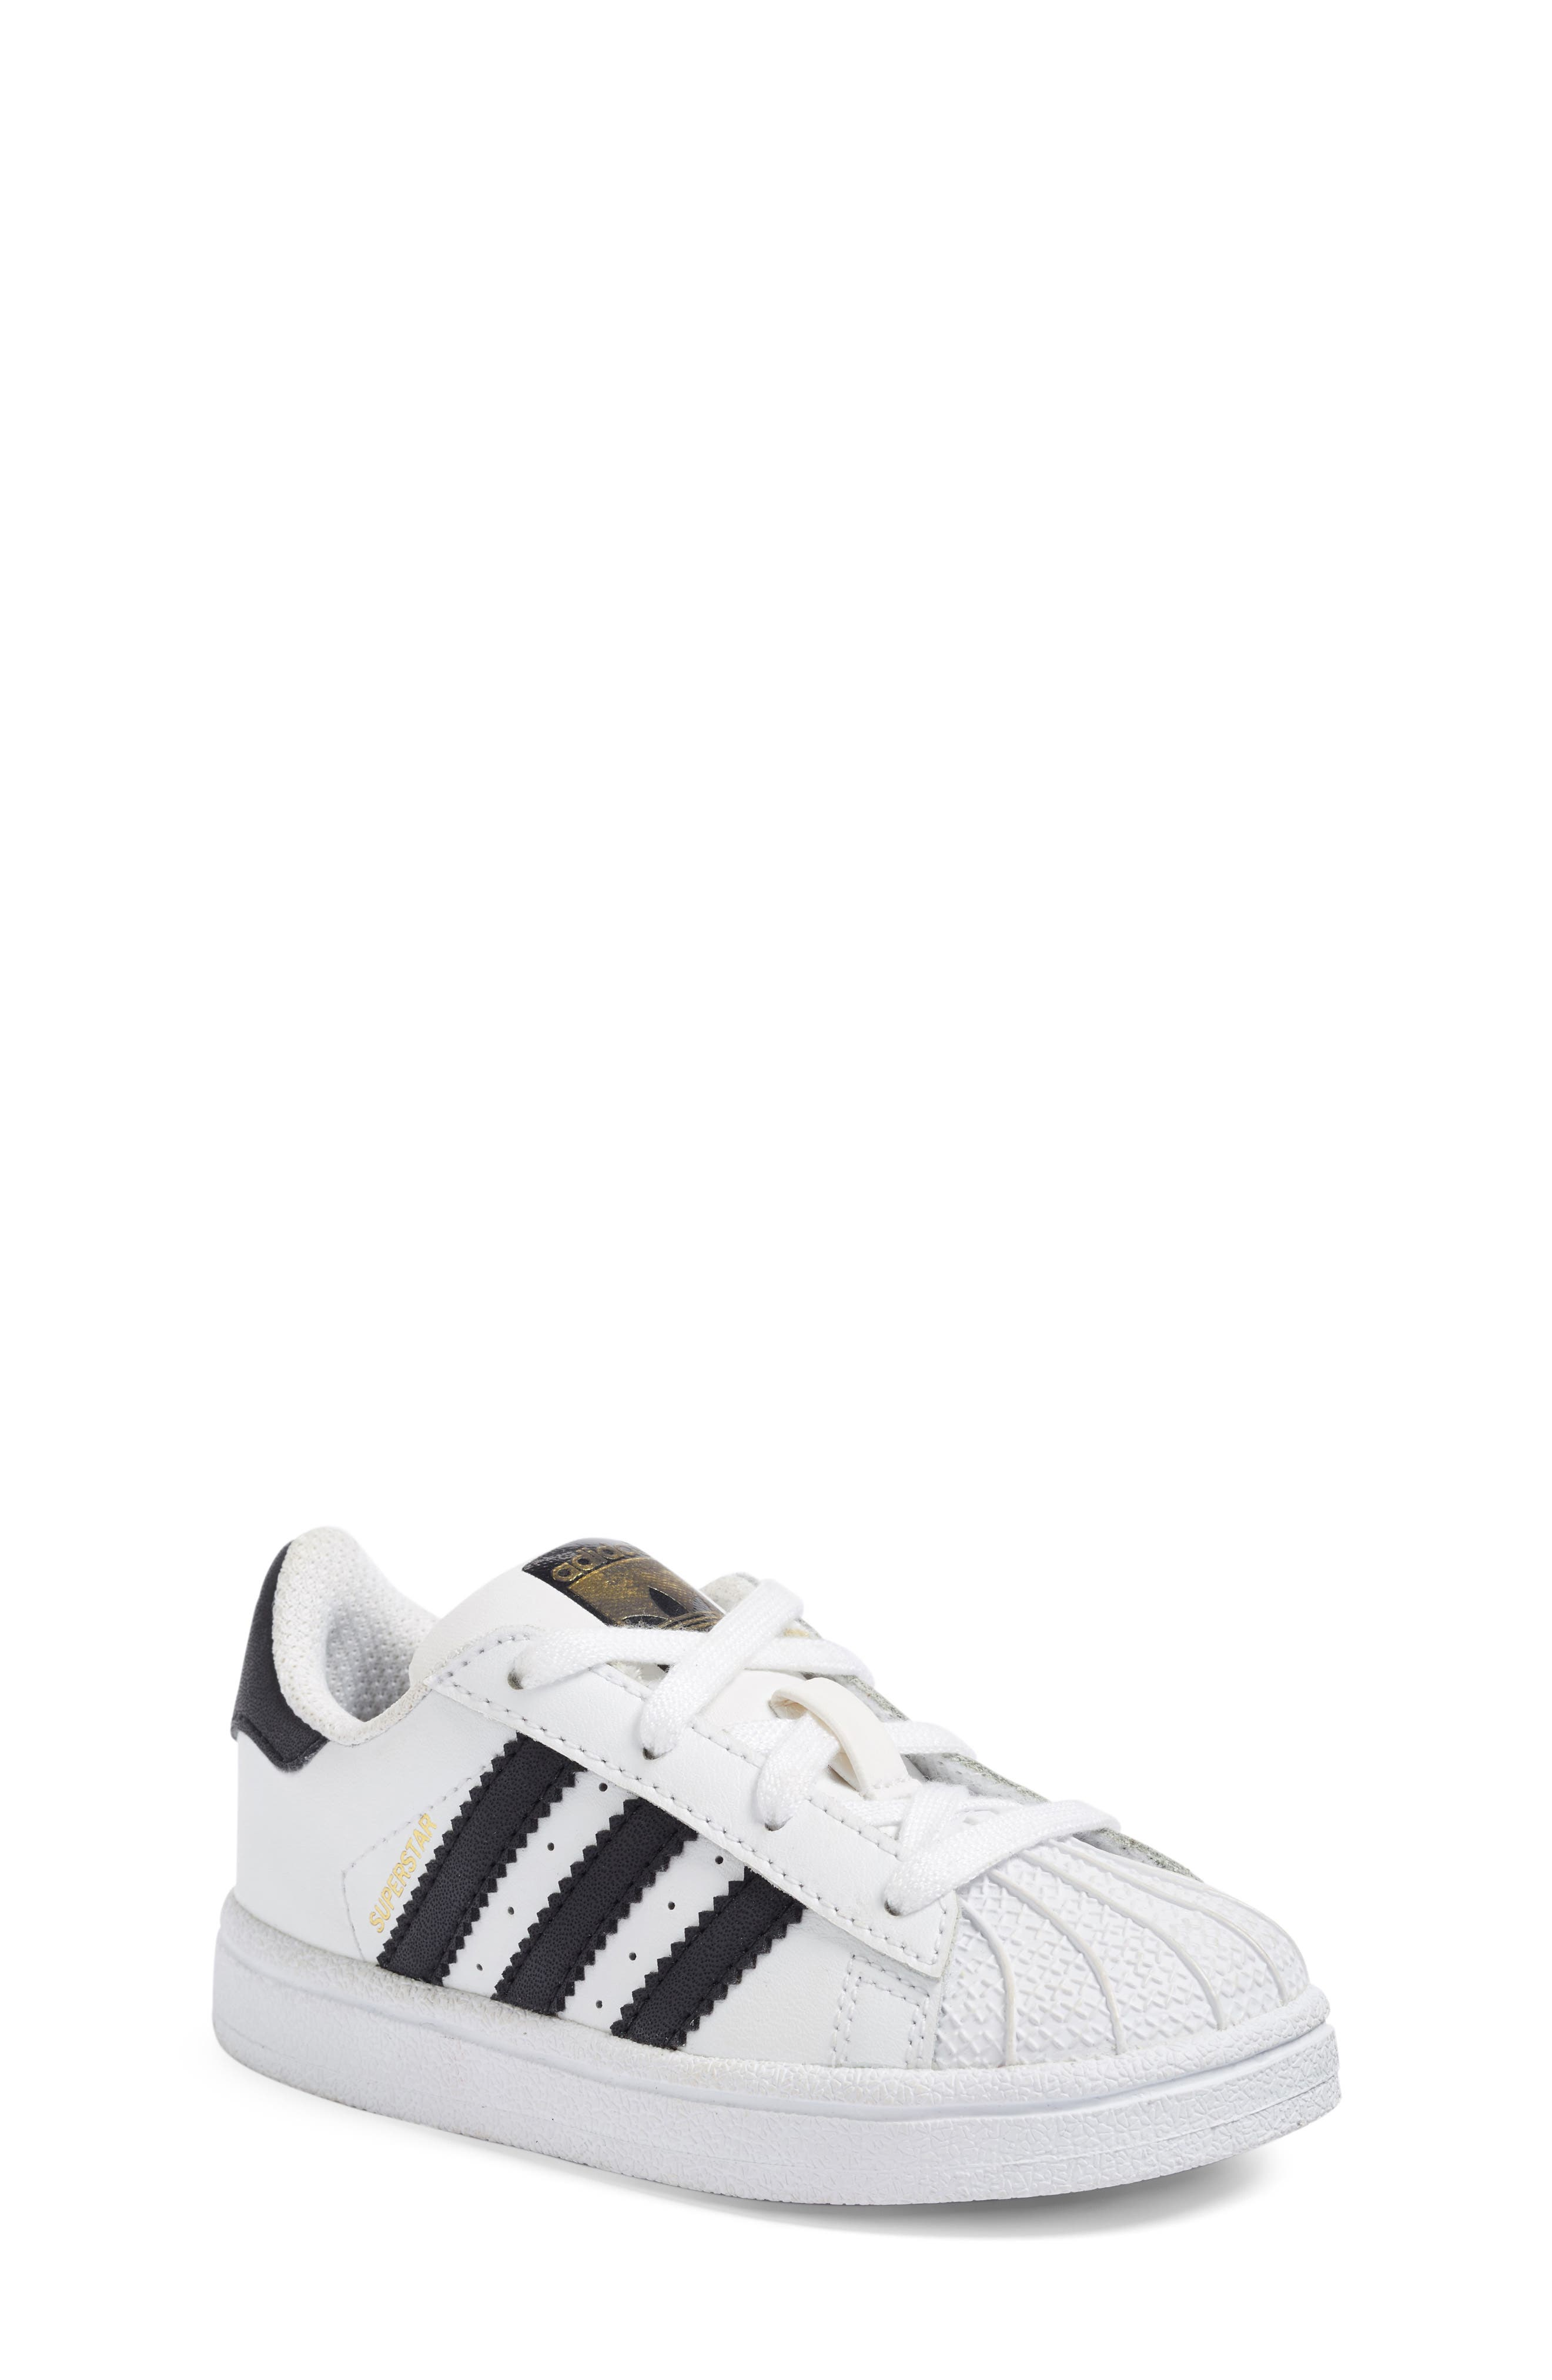 Superstar Foundation Sneaker,                         Main,                         color, 100